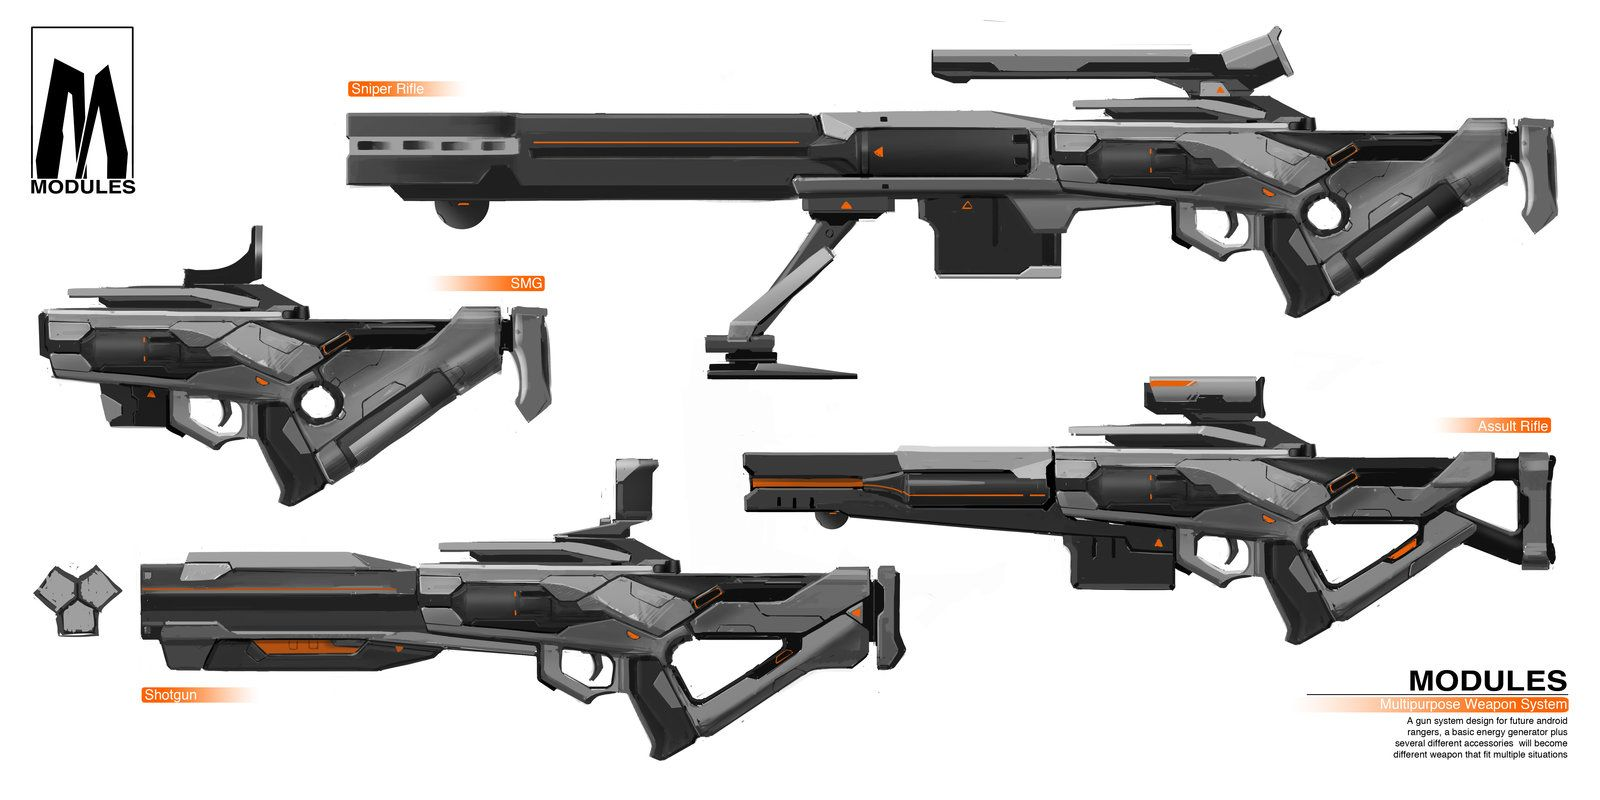 Pin By David Carlock On Weapons